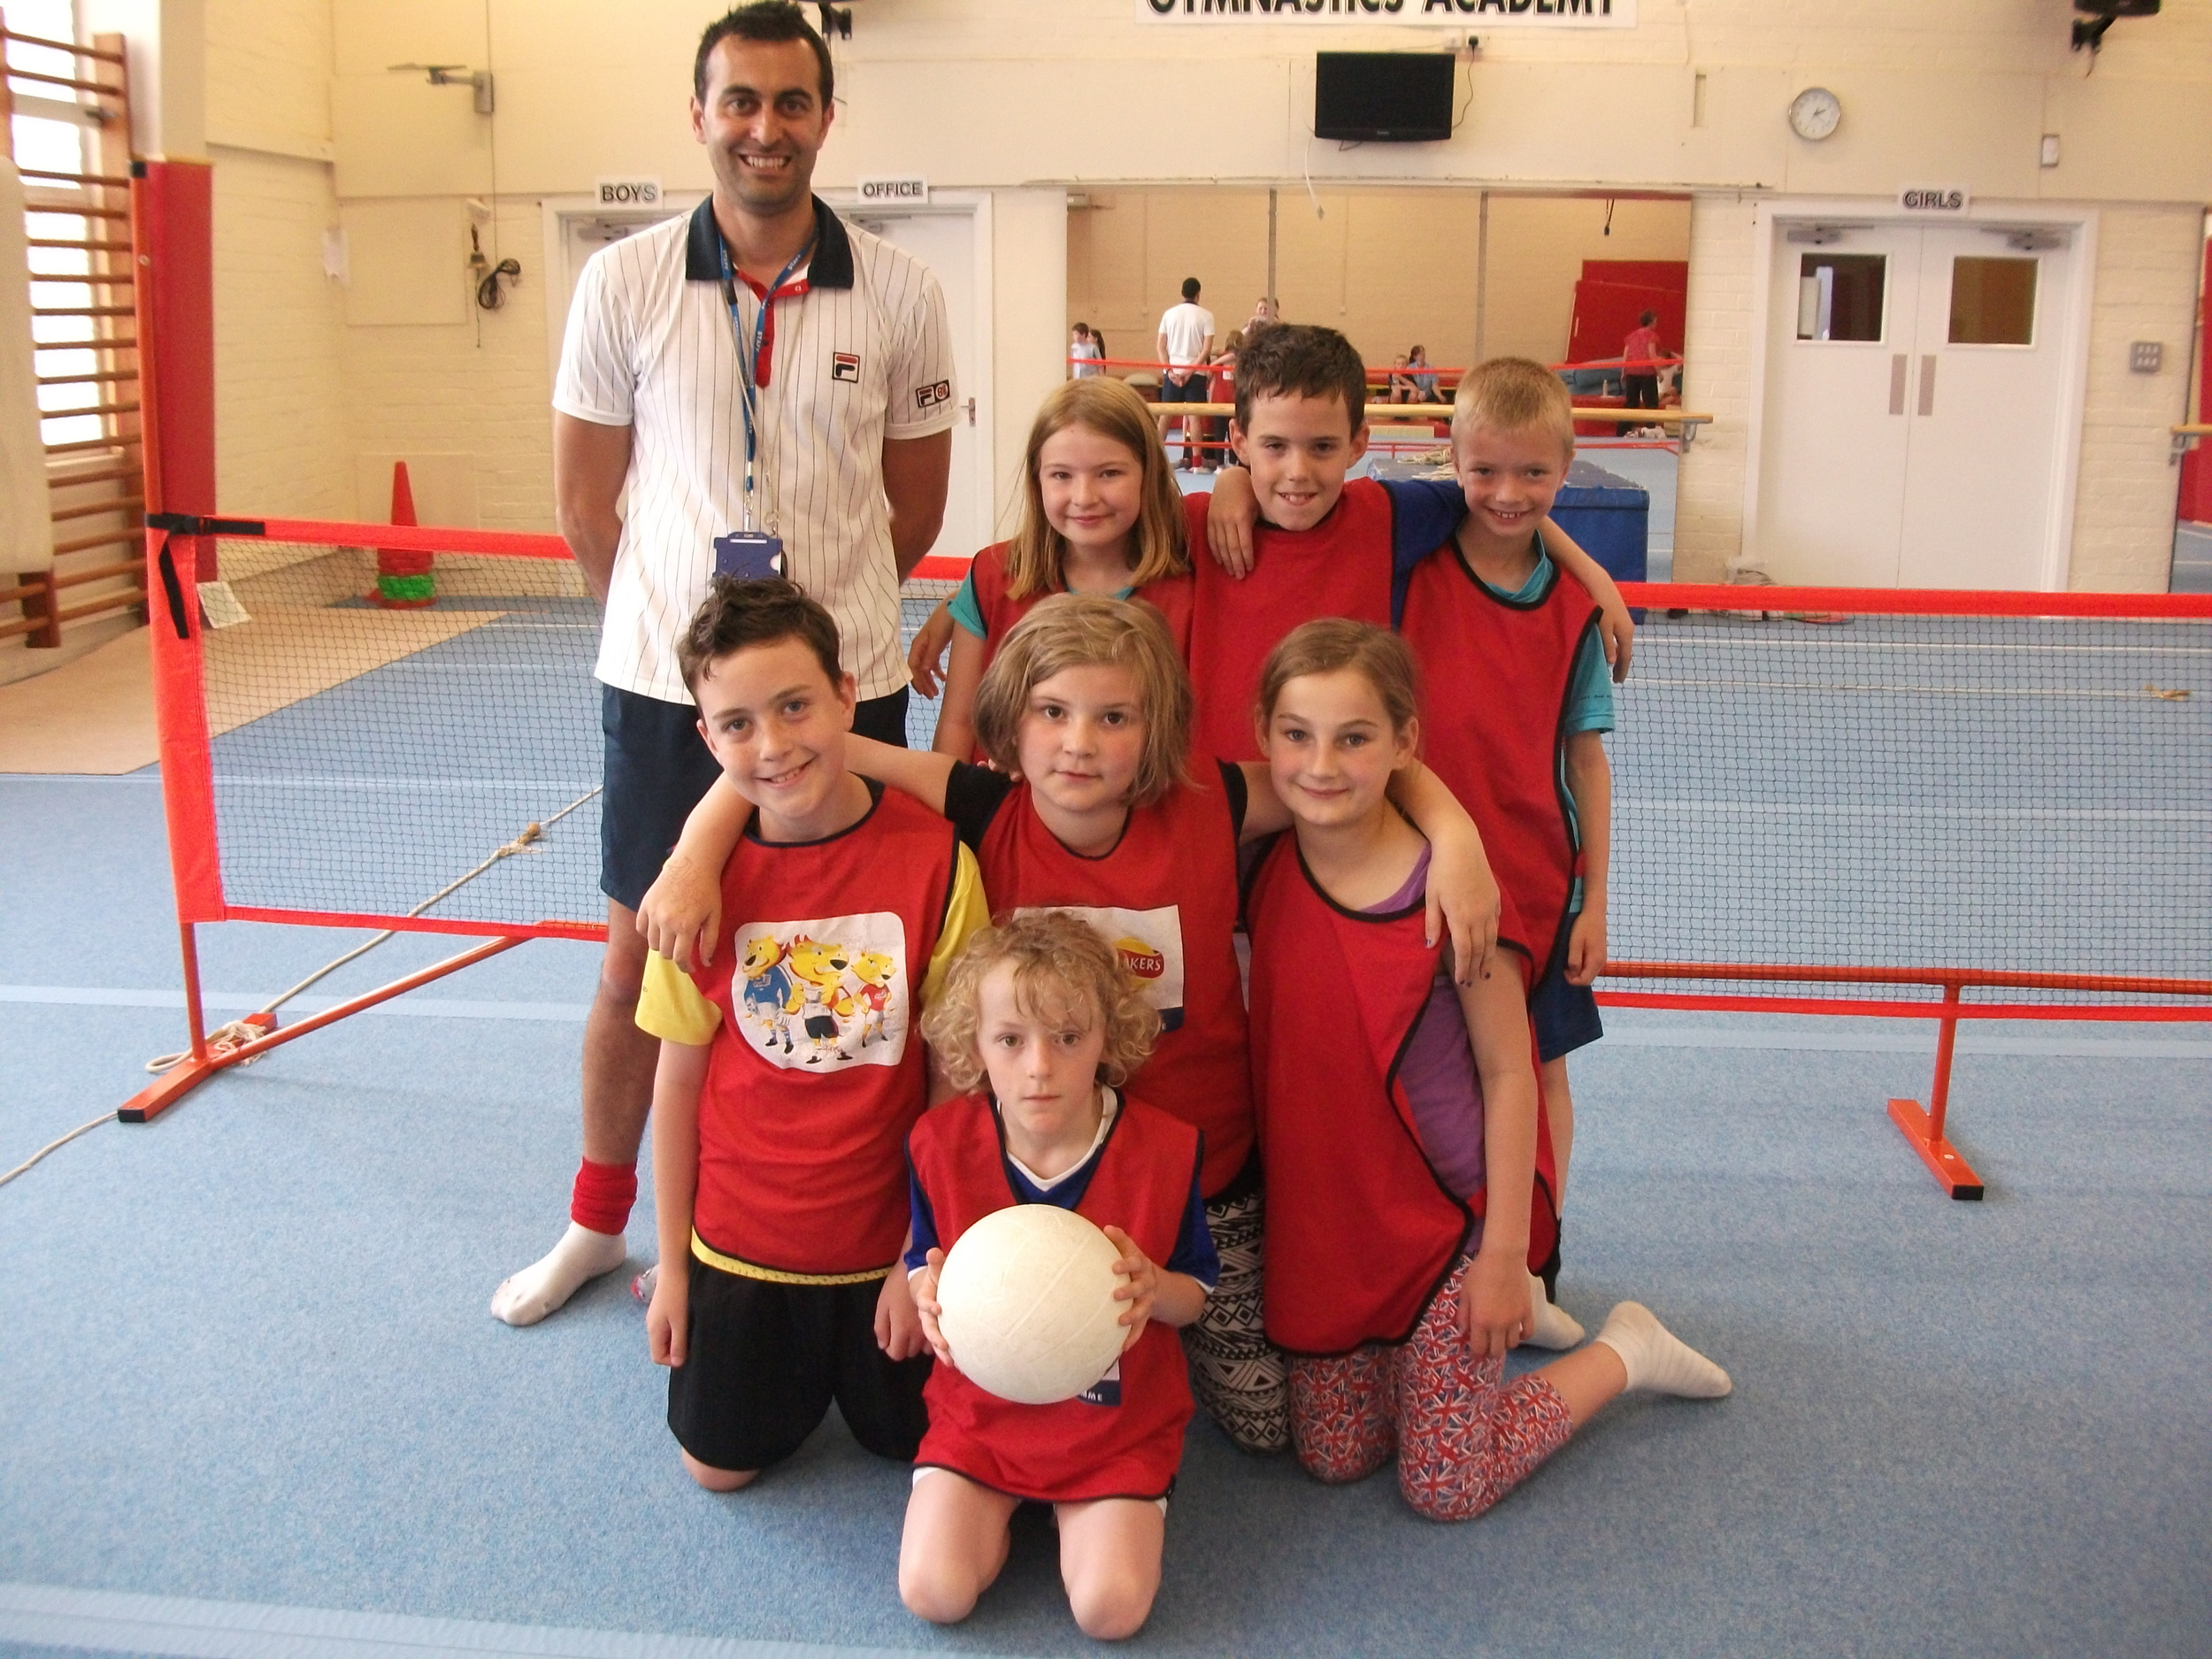 Volleyball2012.JPG